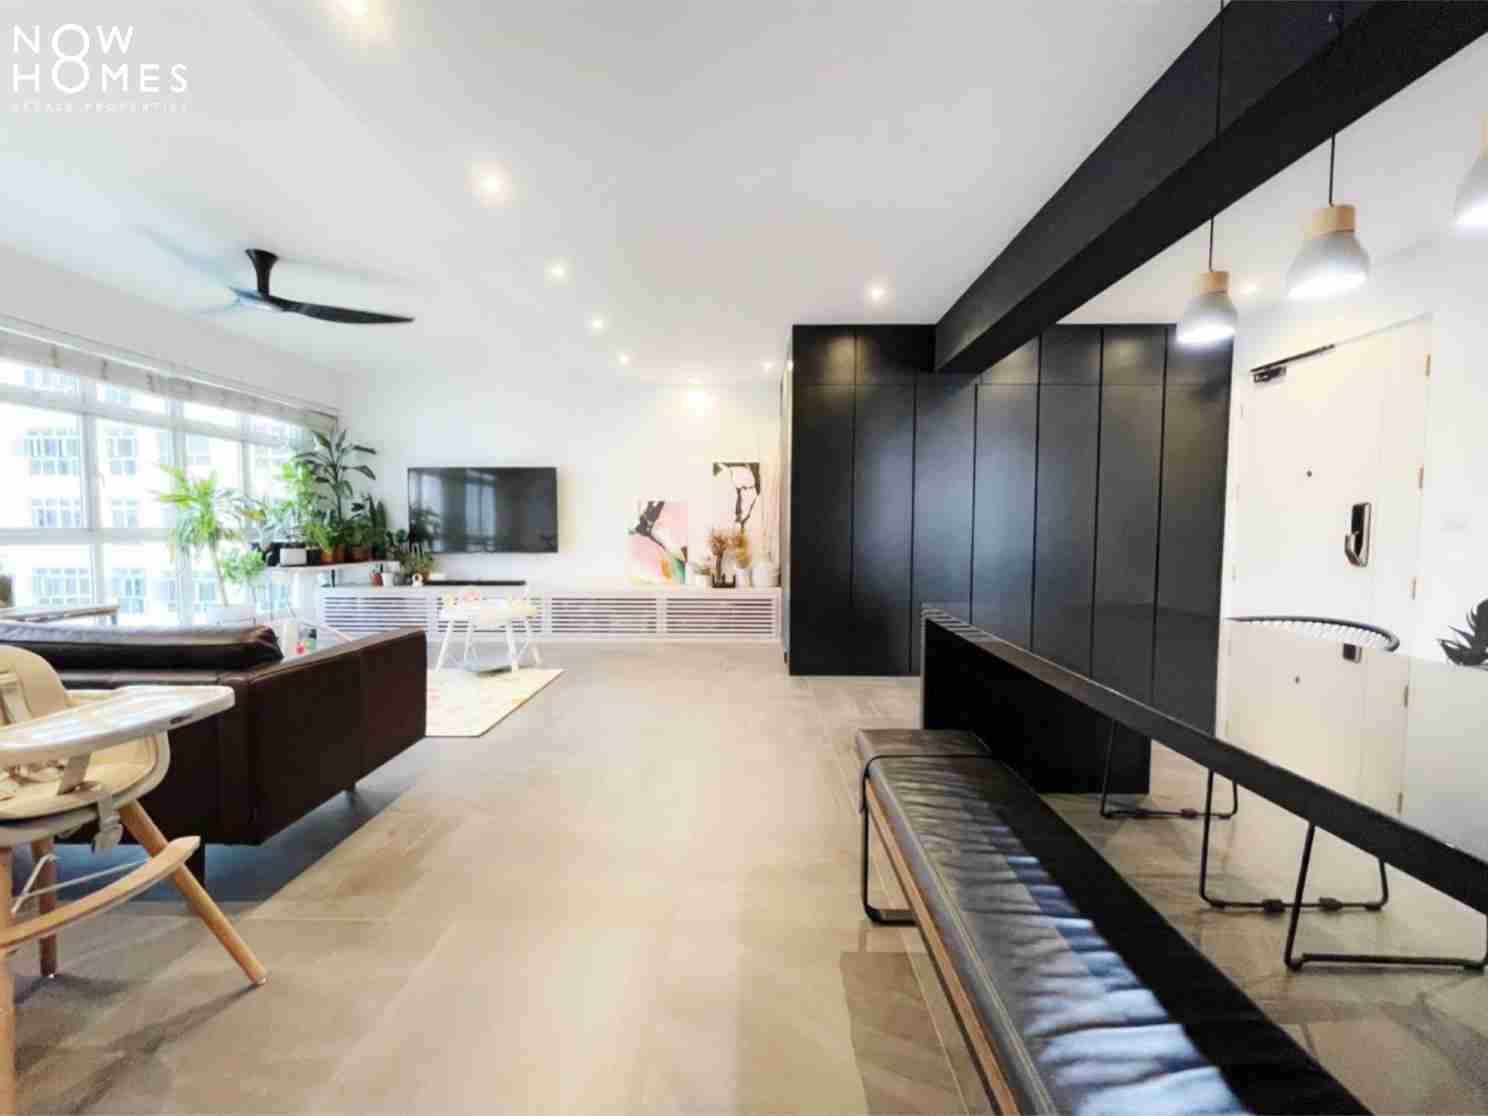 sengkang resale property - 288 compassvale - Living Room bench straight view